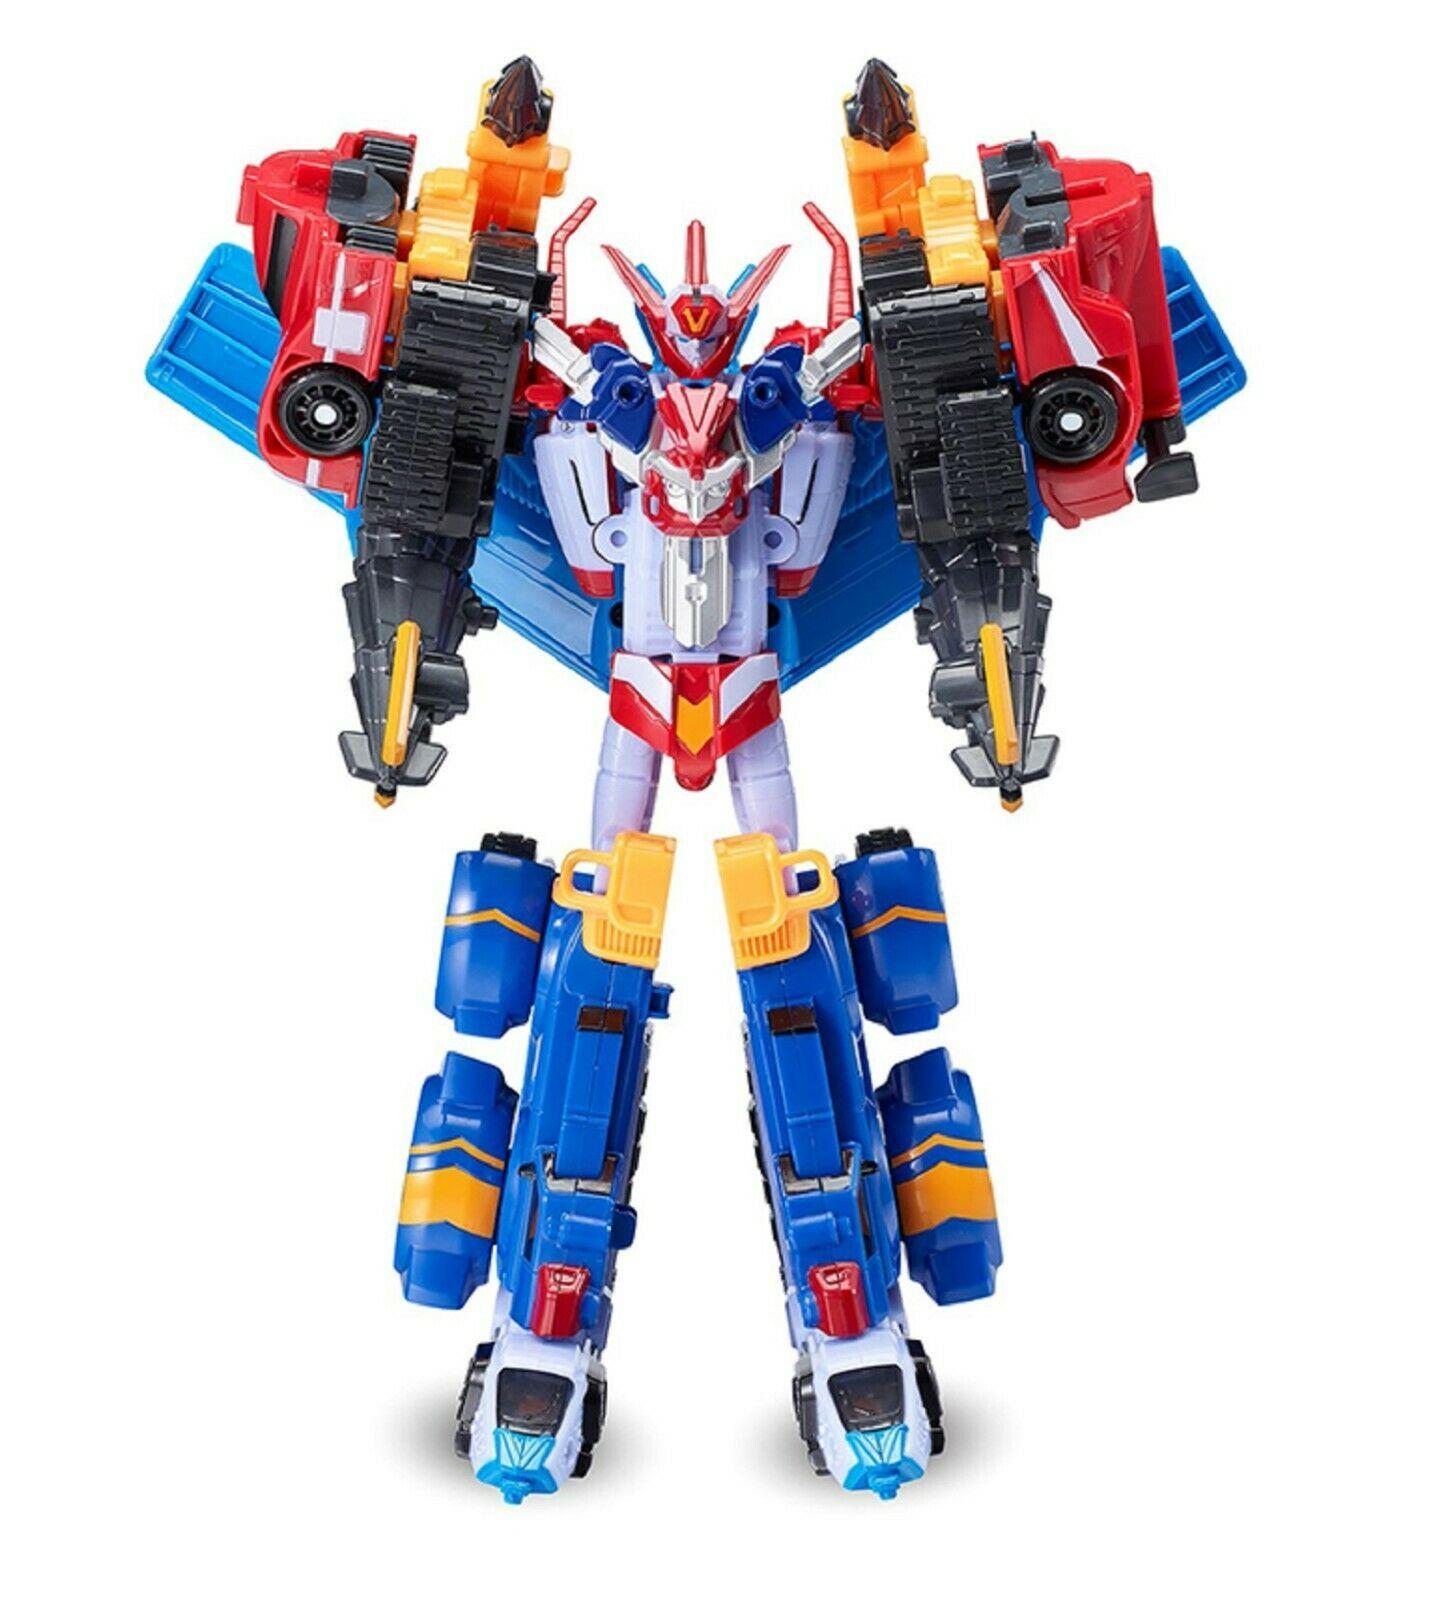 Tobot Mini Master V Transformation Action Figure Toy Robot